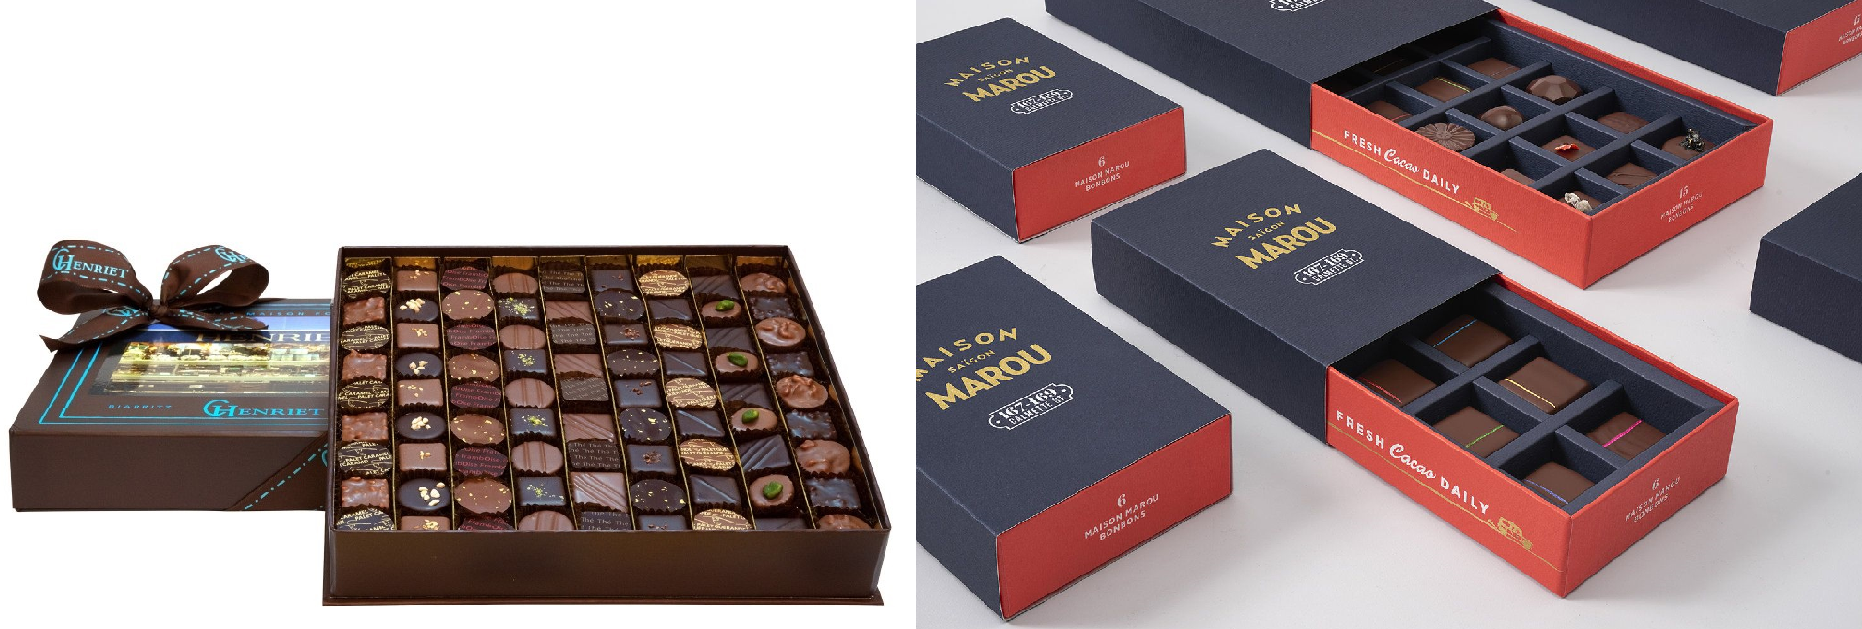 packaging chocolat coffret Marou